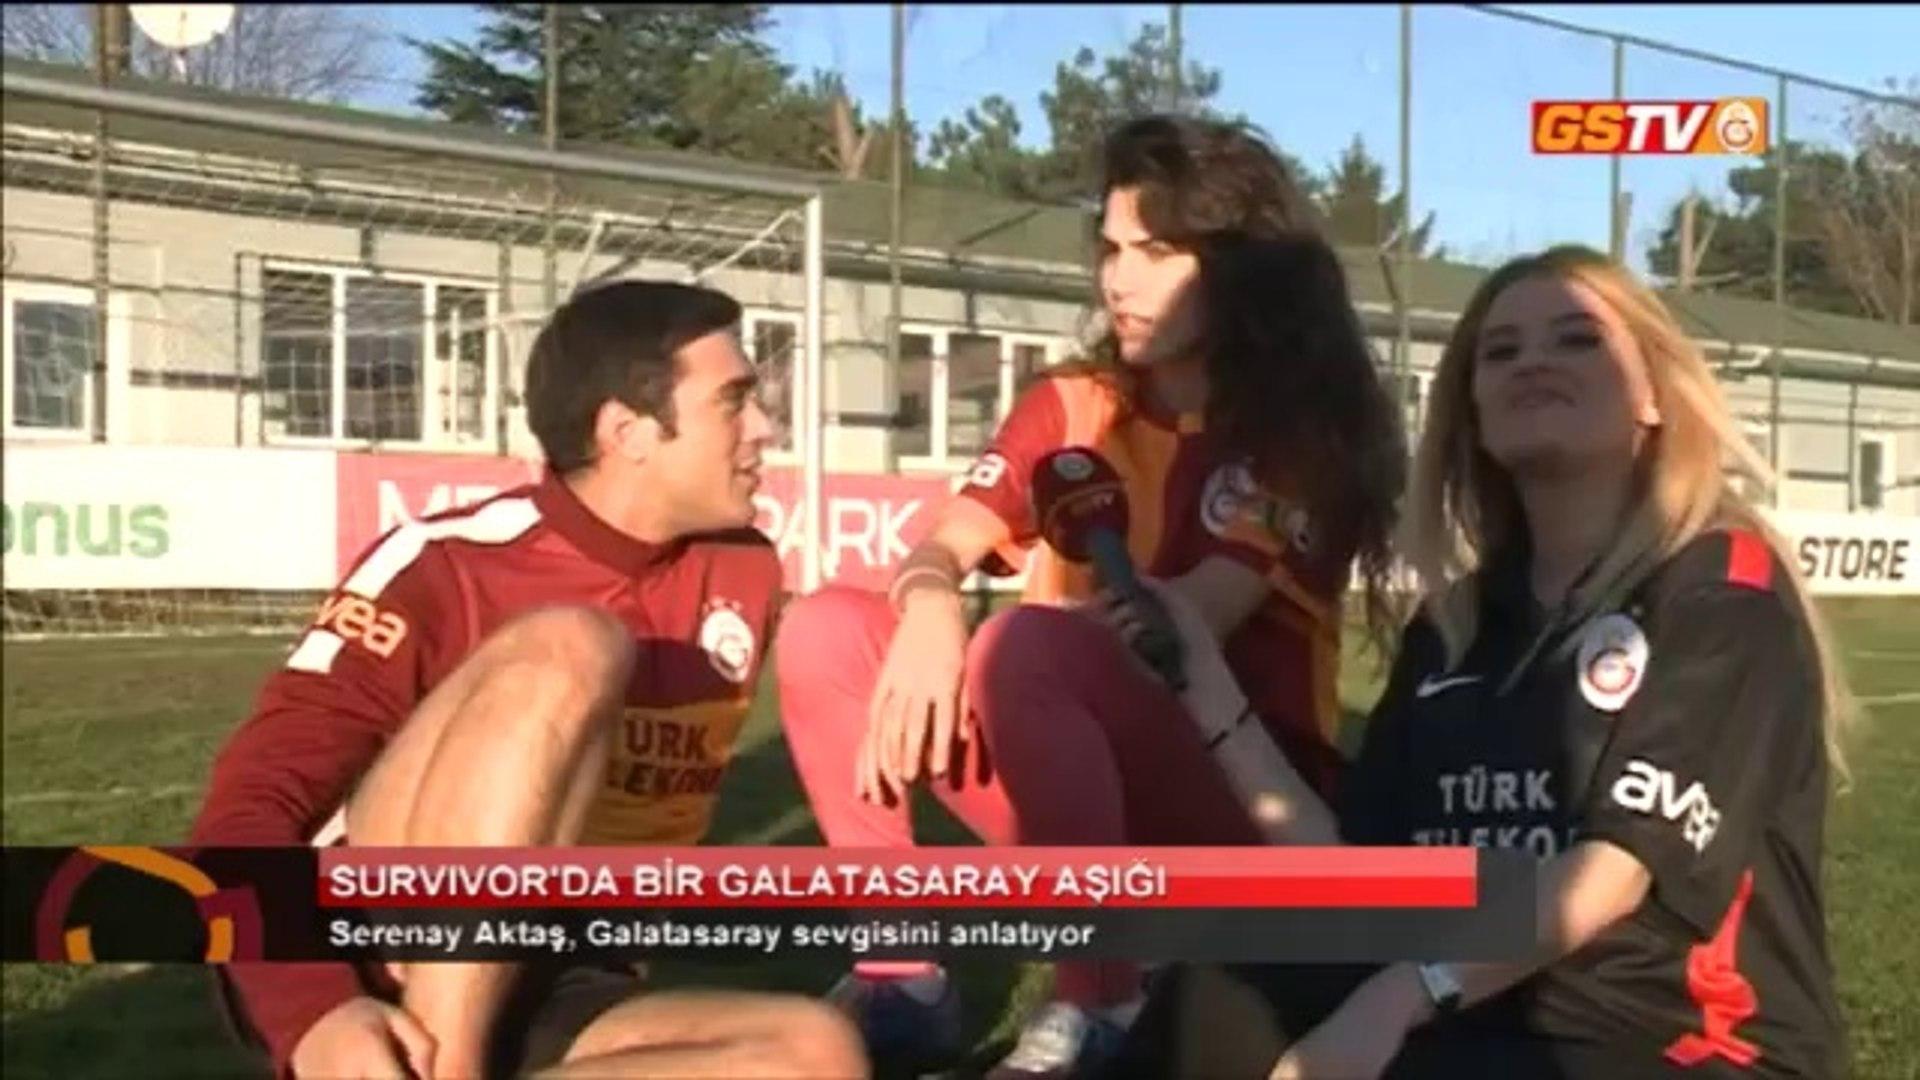 GSTV Survivor'da bir Galatasaray Aşığı Serenay Aktaş